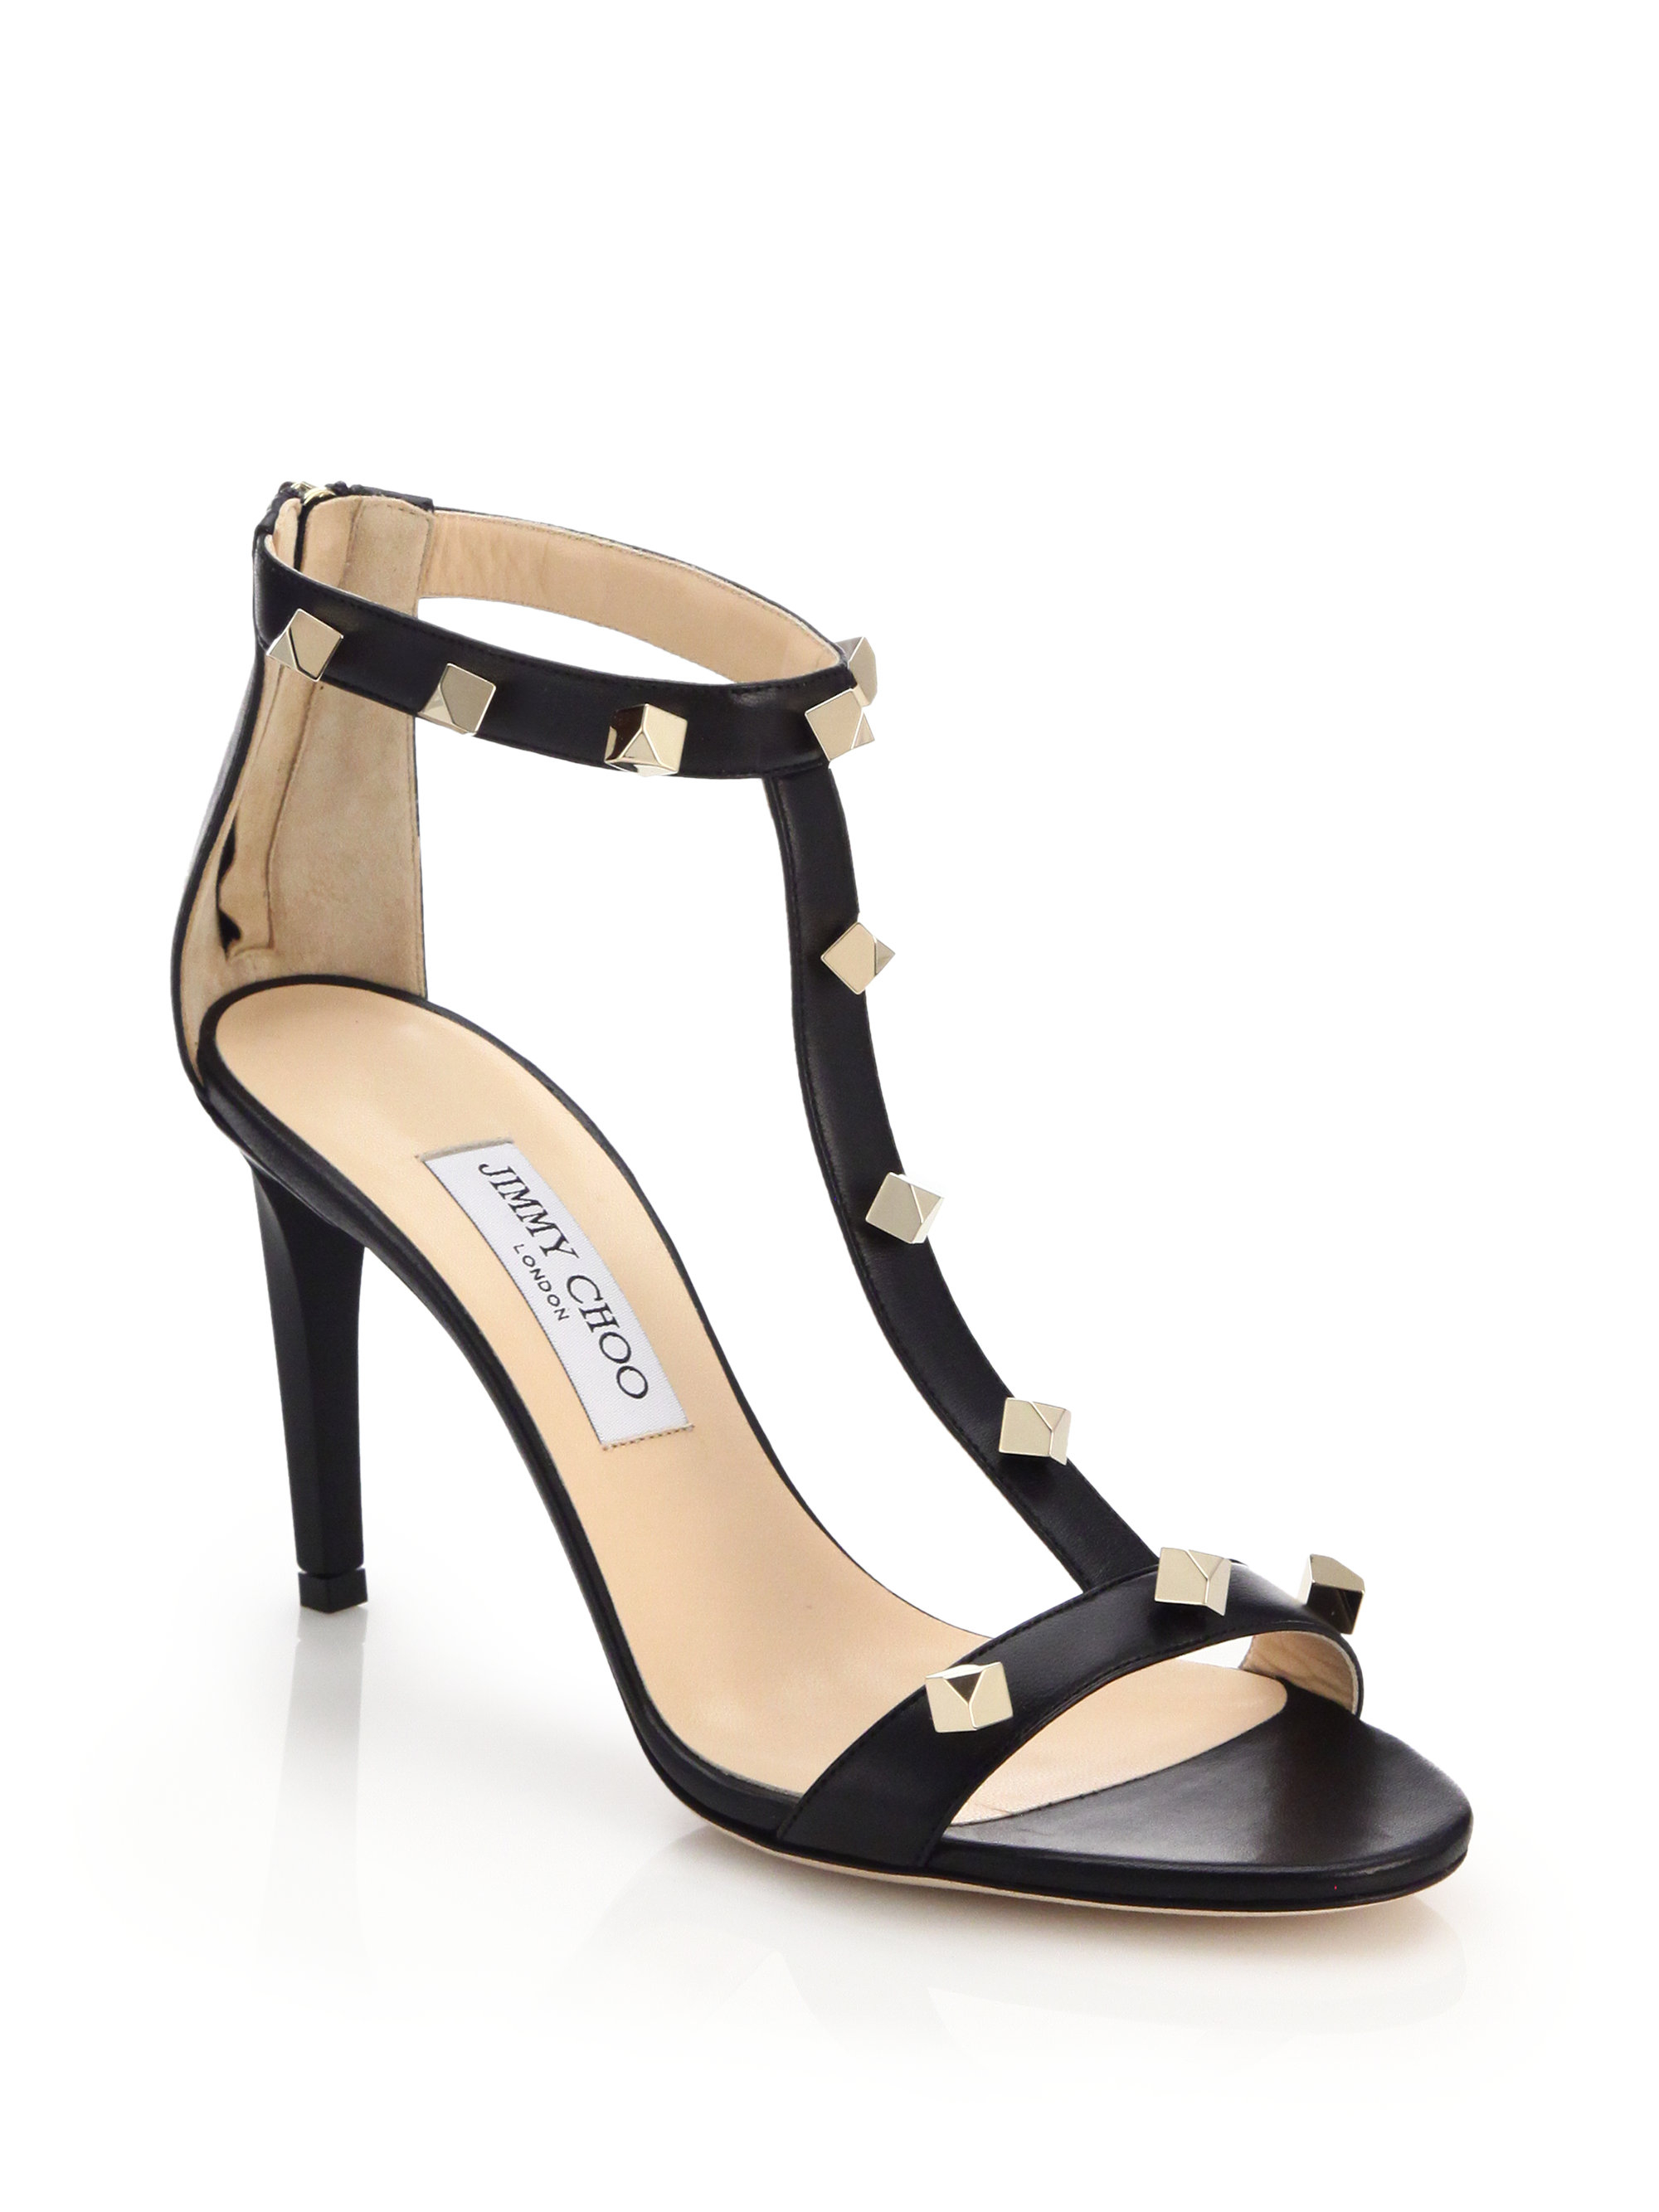 199af655060 Lyst - Jimmy Choo Lamba Studded Leather Sandals in Black